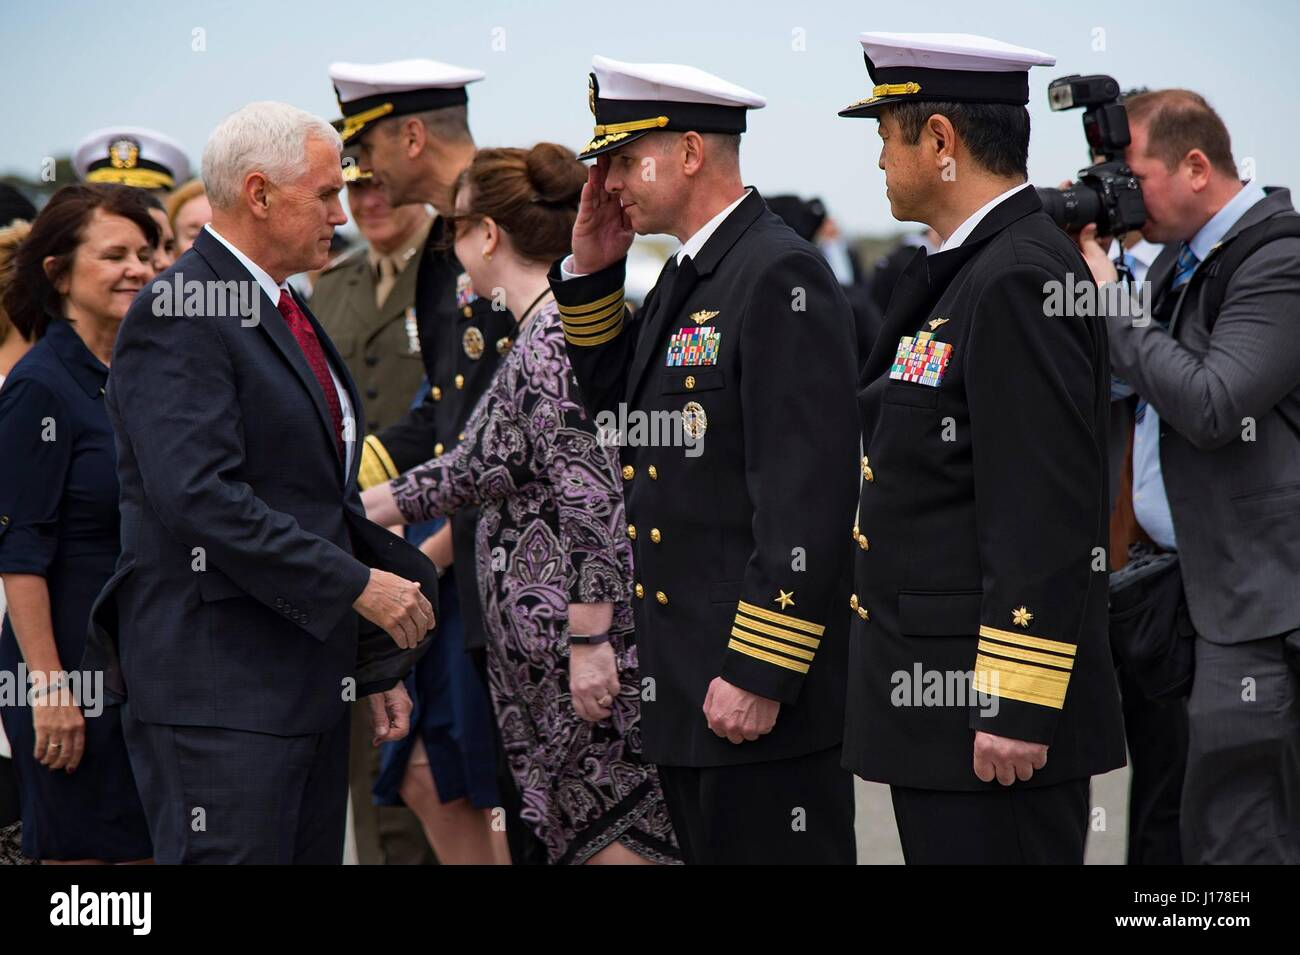 Michael Doan, Japan. 18. April 2017. US-Vizepräsident Mike Pence, ist links, von Captain John Bushey, NAF Atsugi Stockfoto